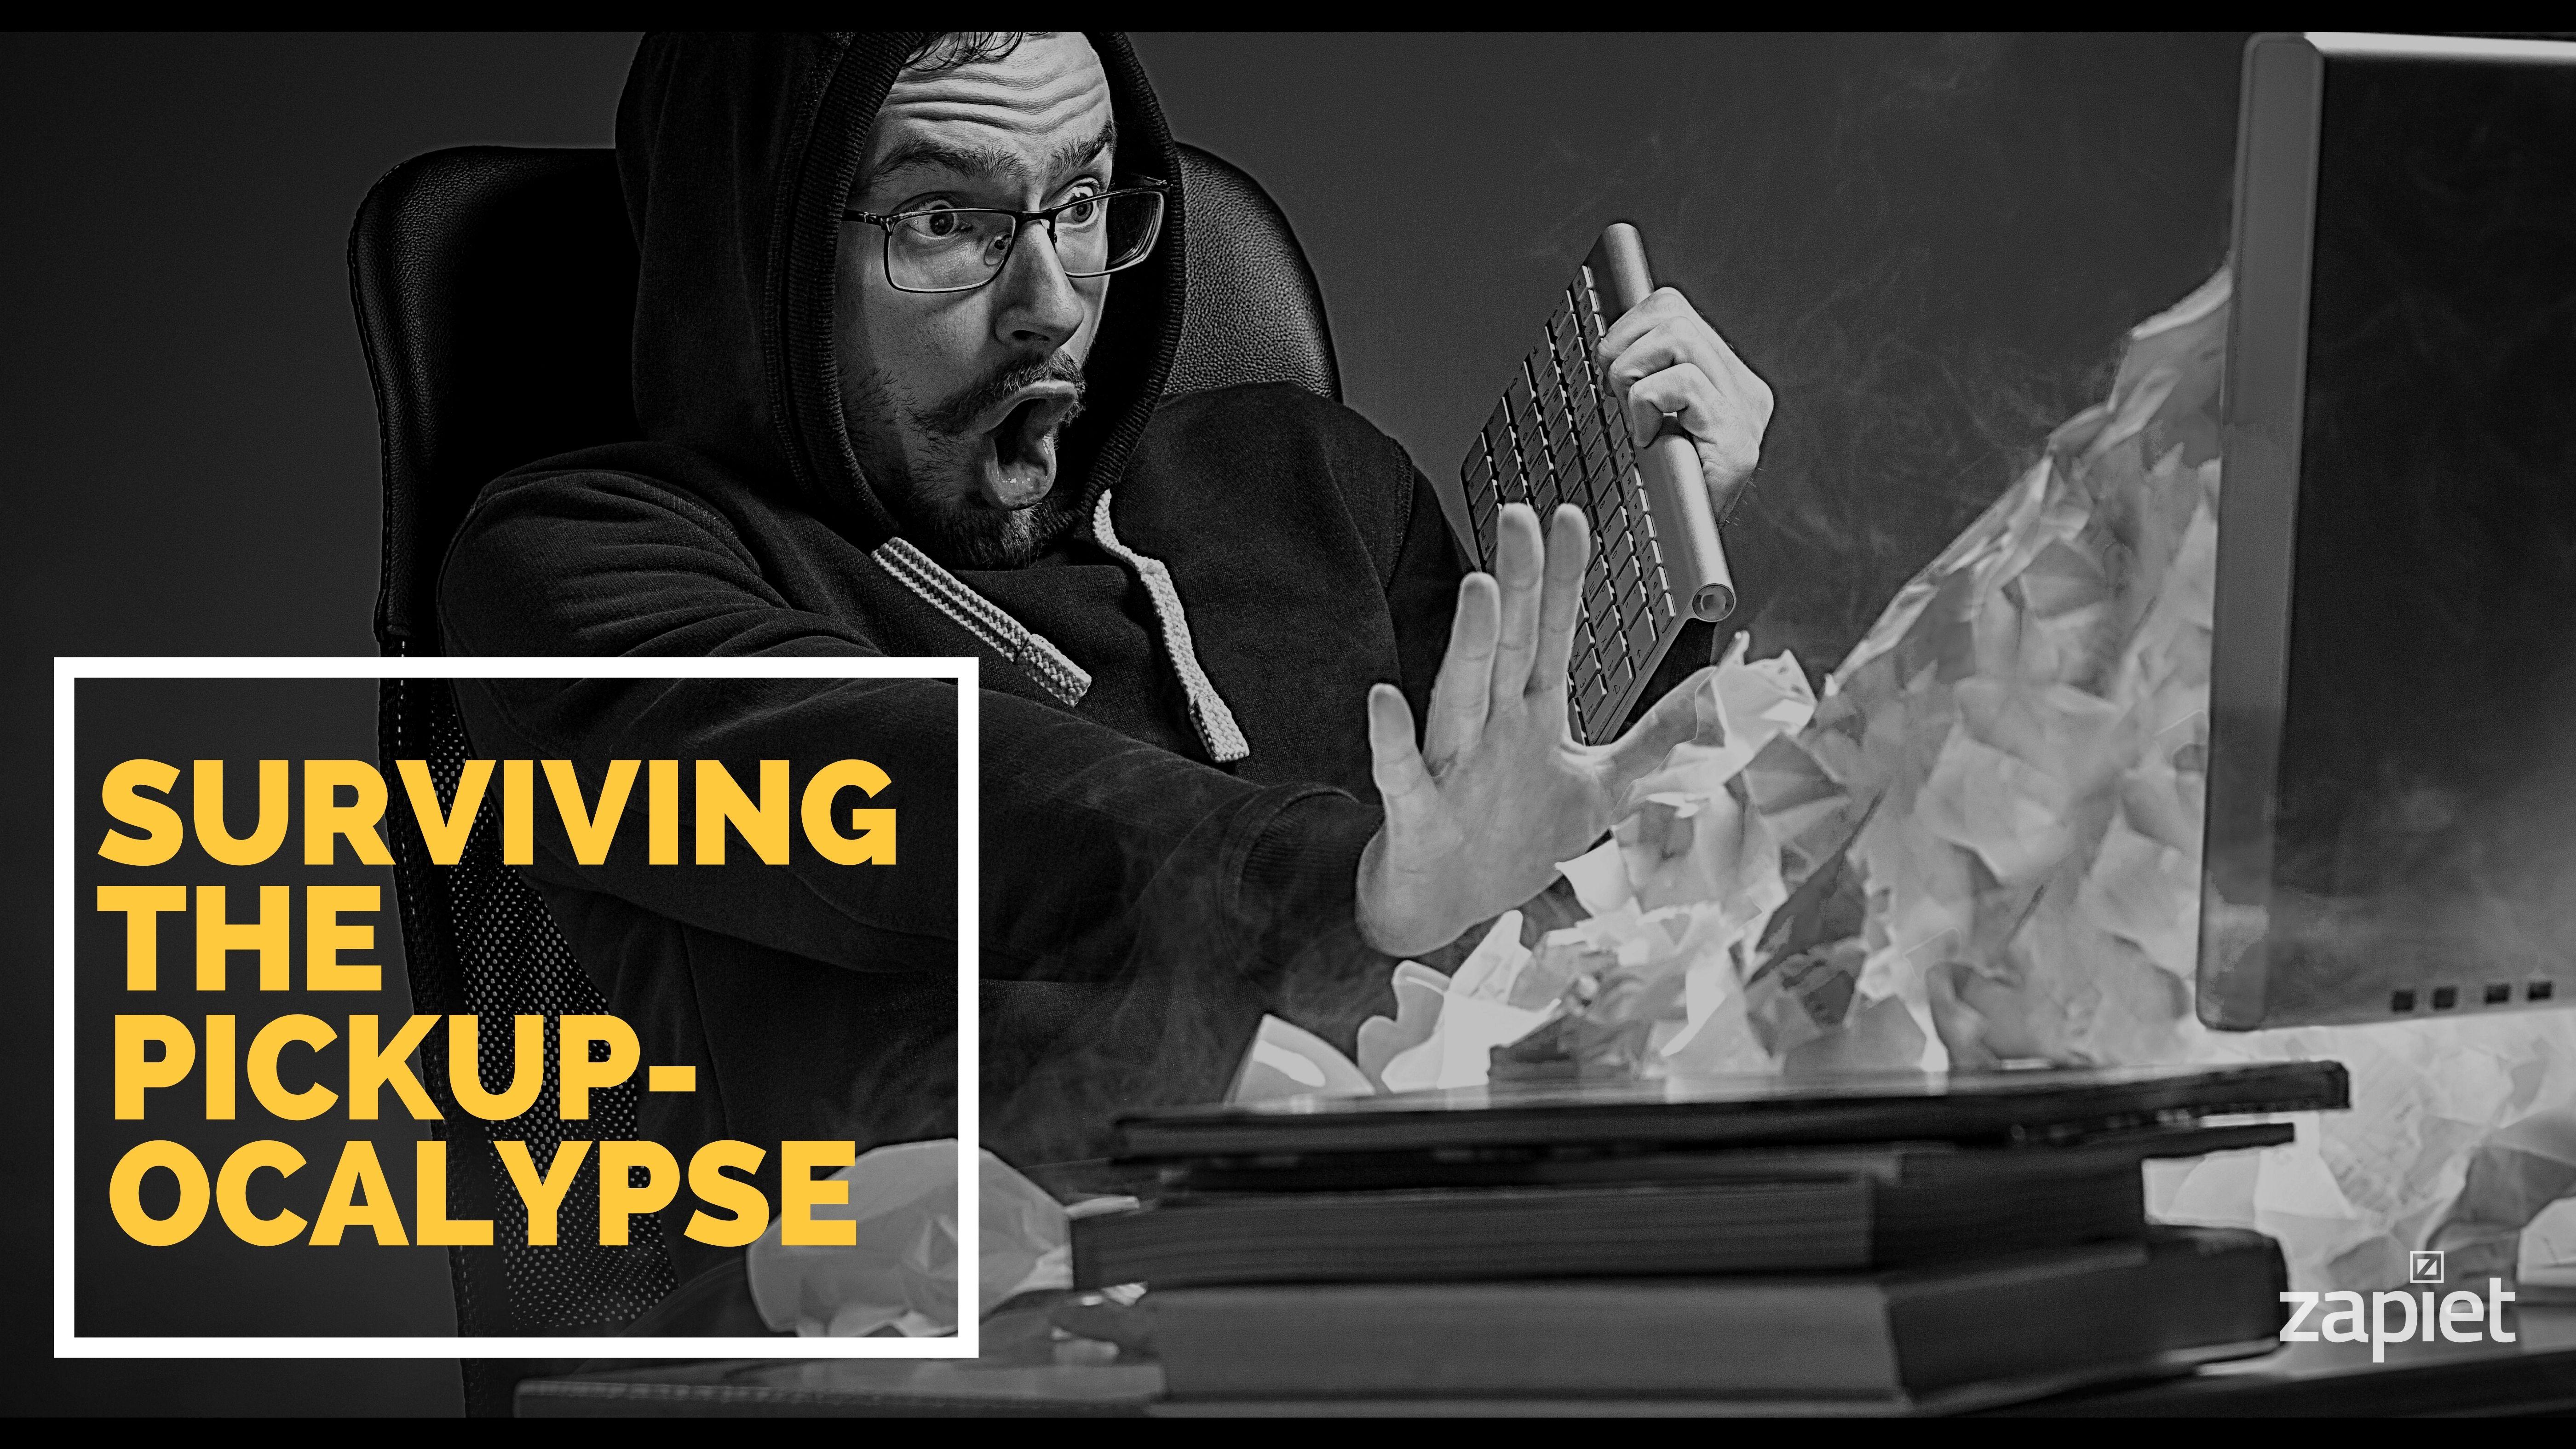 Surviving the Pickup-ocalypse